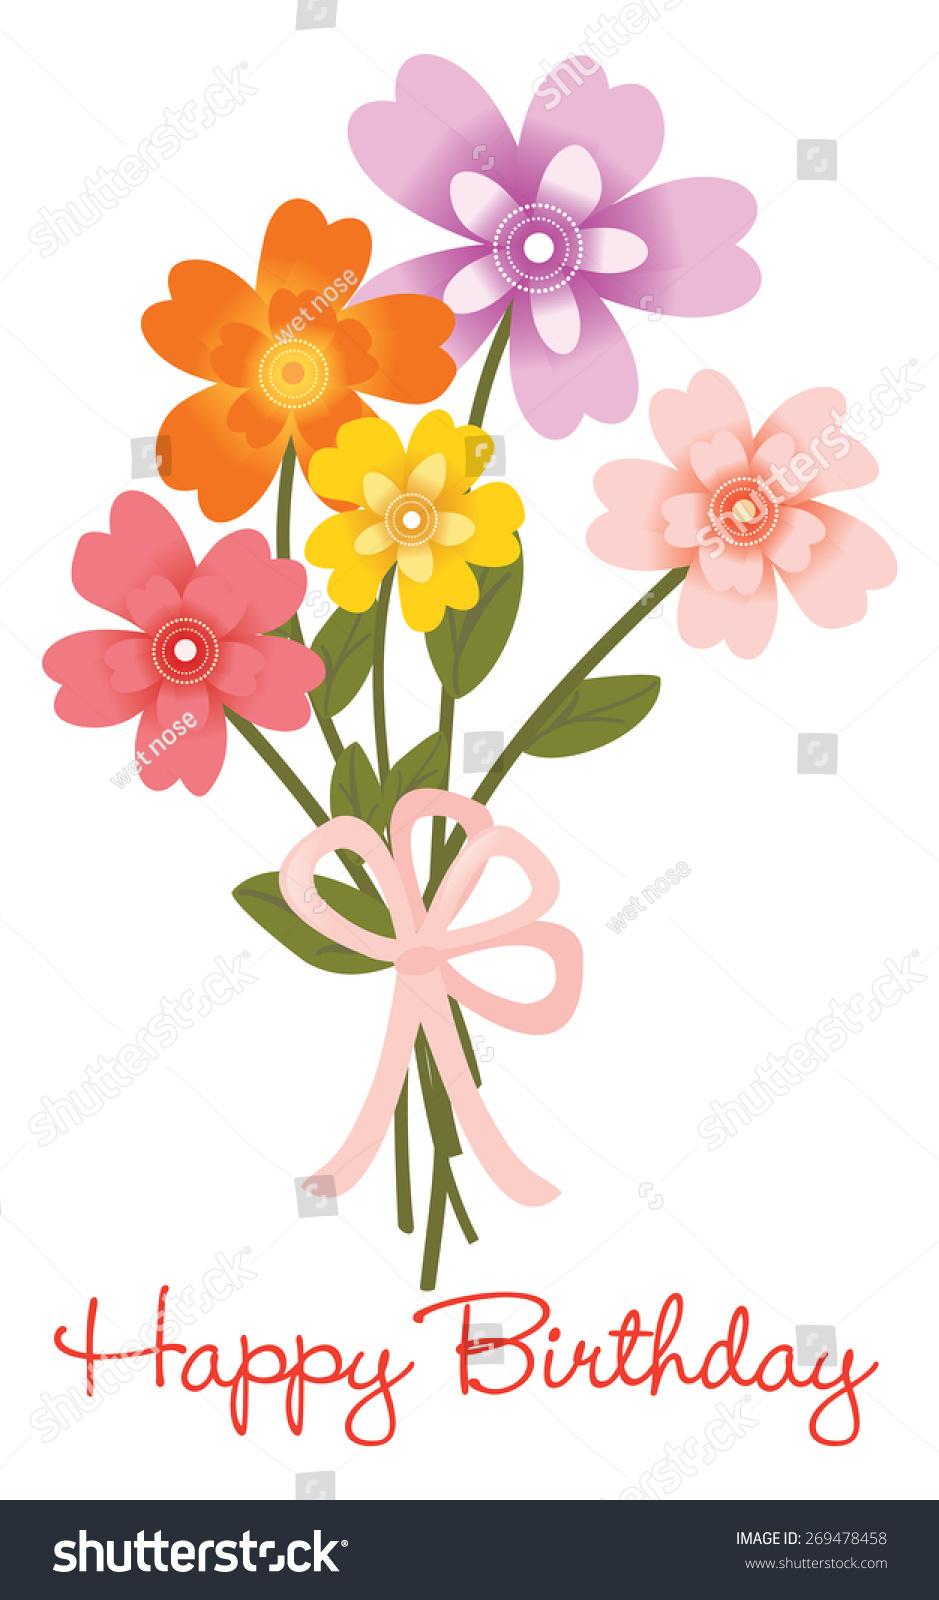 Happy birthday flower bouquet jpeg stock illustration 269478458 happy birthday flower bouquet jpeg izmirmasajfo